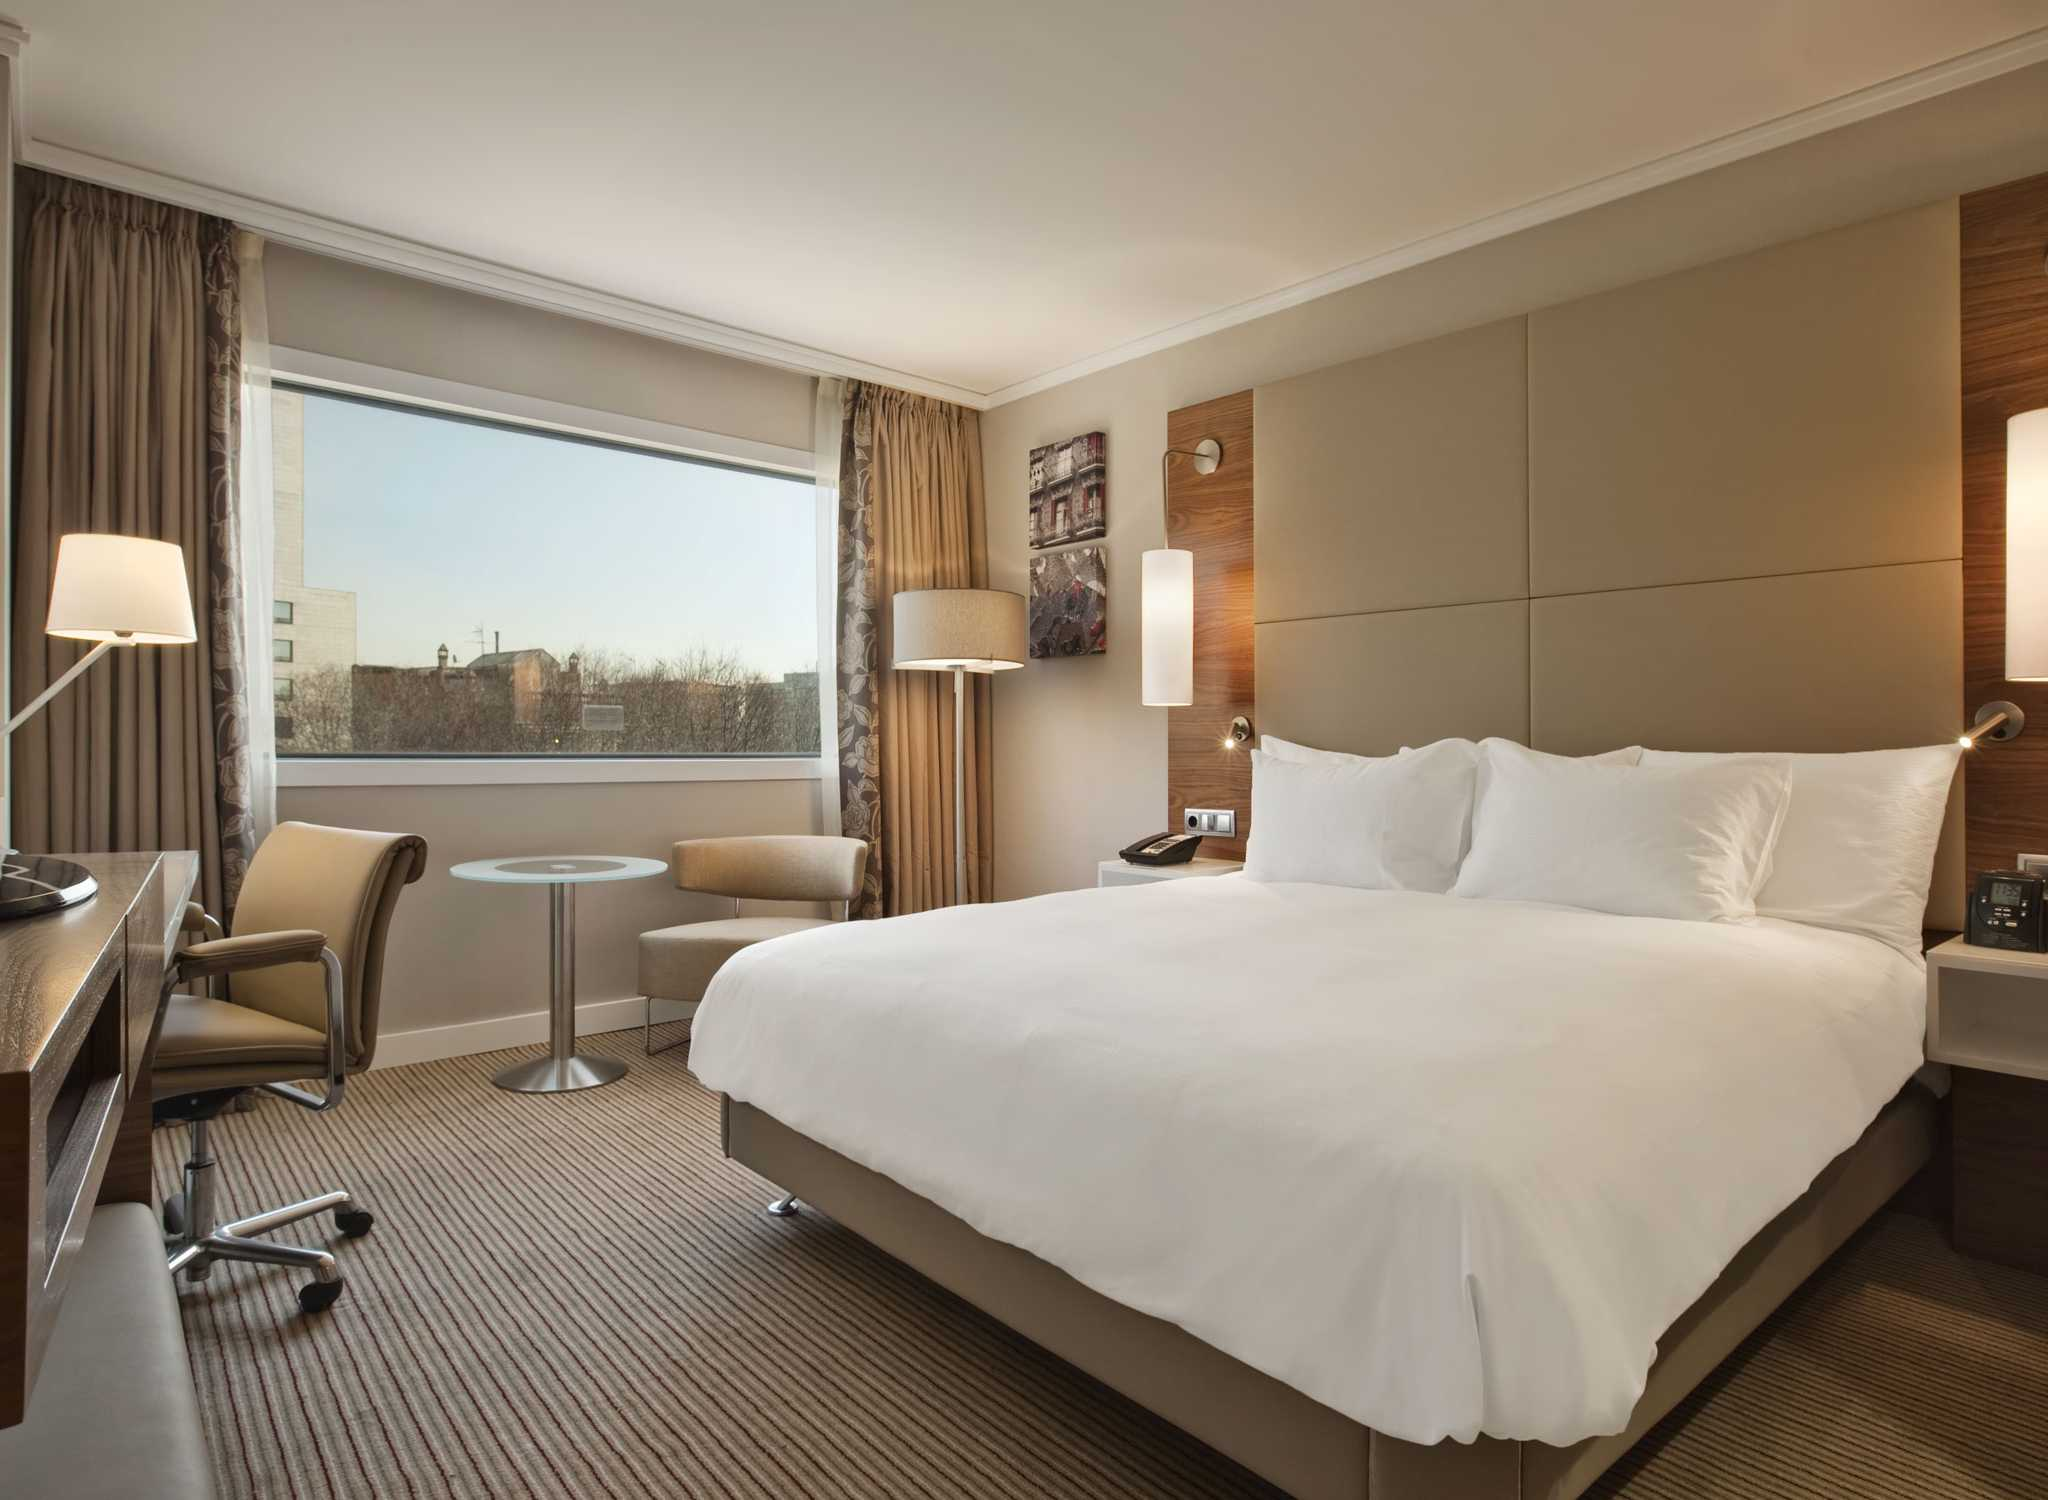 Hoteles en espa a barcelona madrid mallorca hilton for Hoteles con habitaciones cuadruples en barcelona